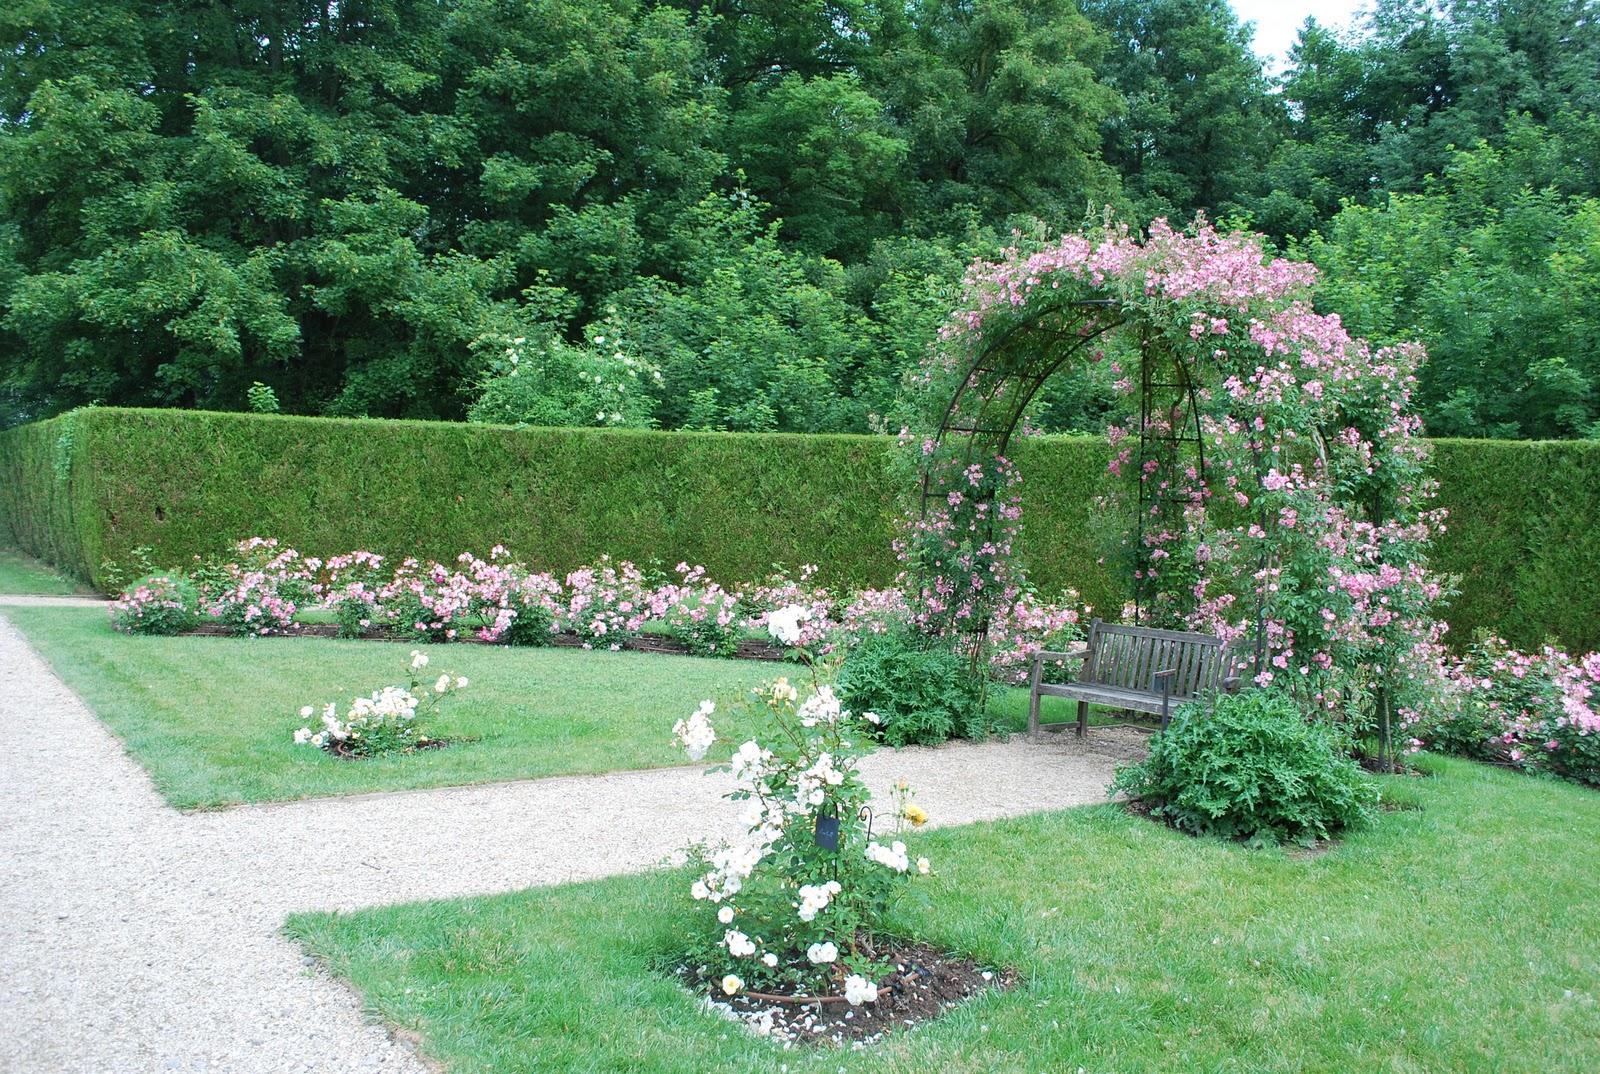 Pralineries le jardin secret for Le jardin secret